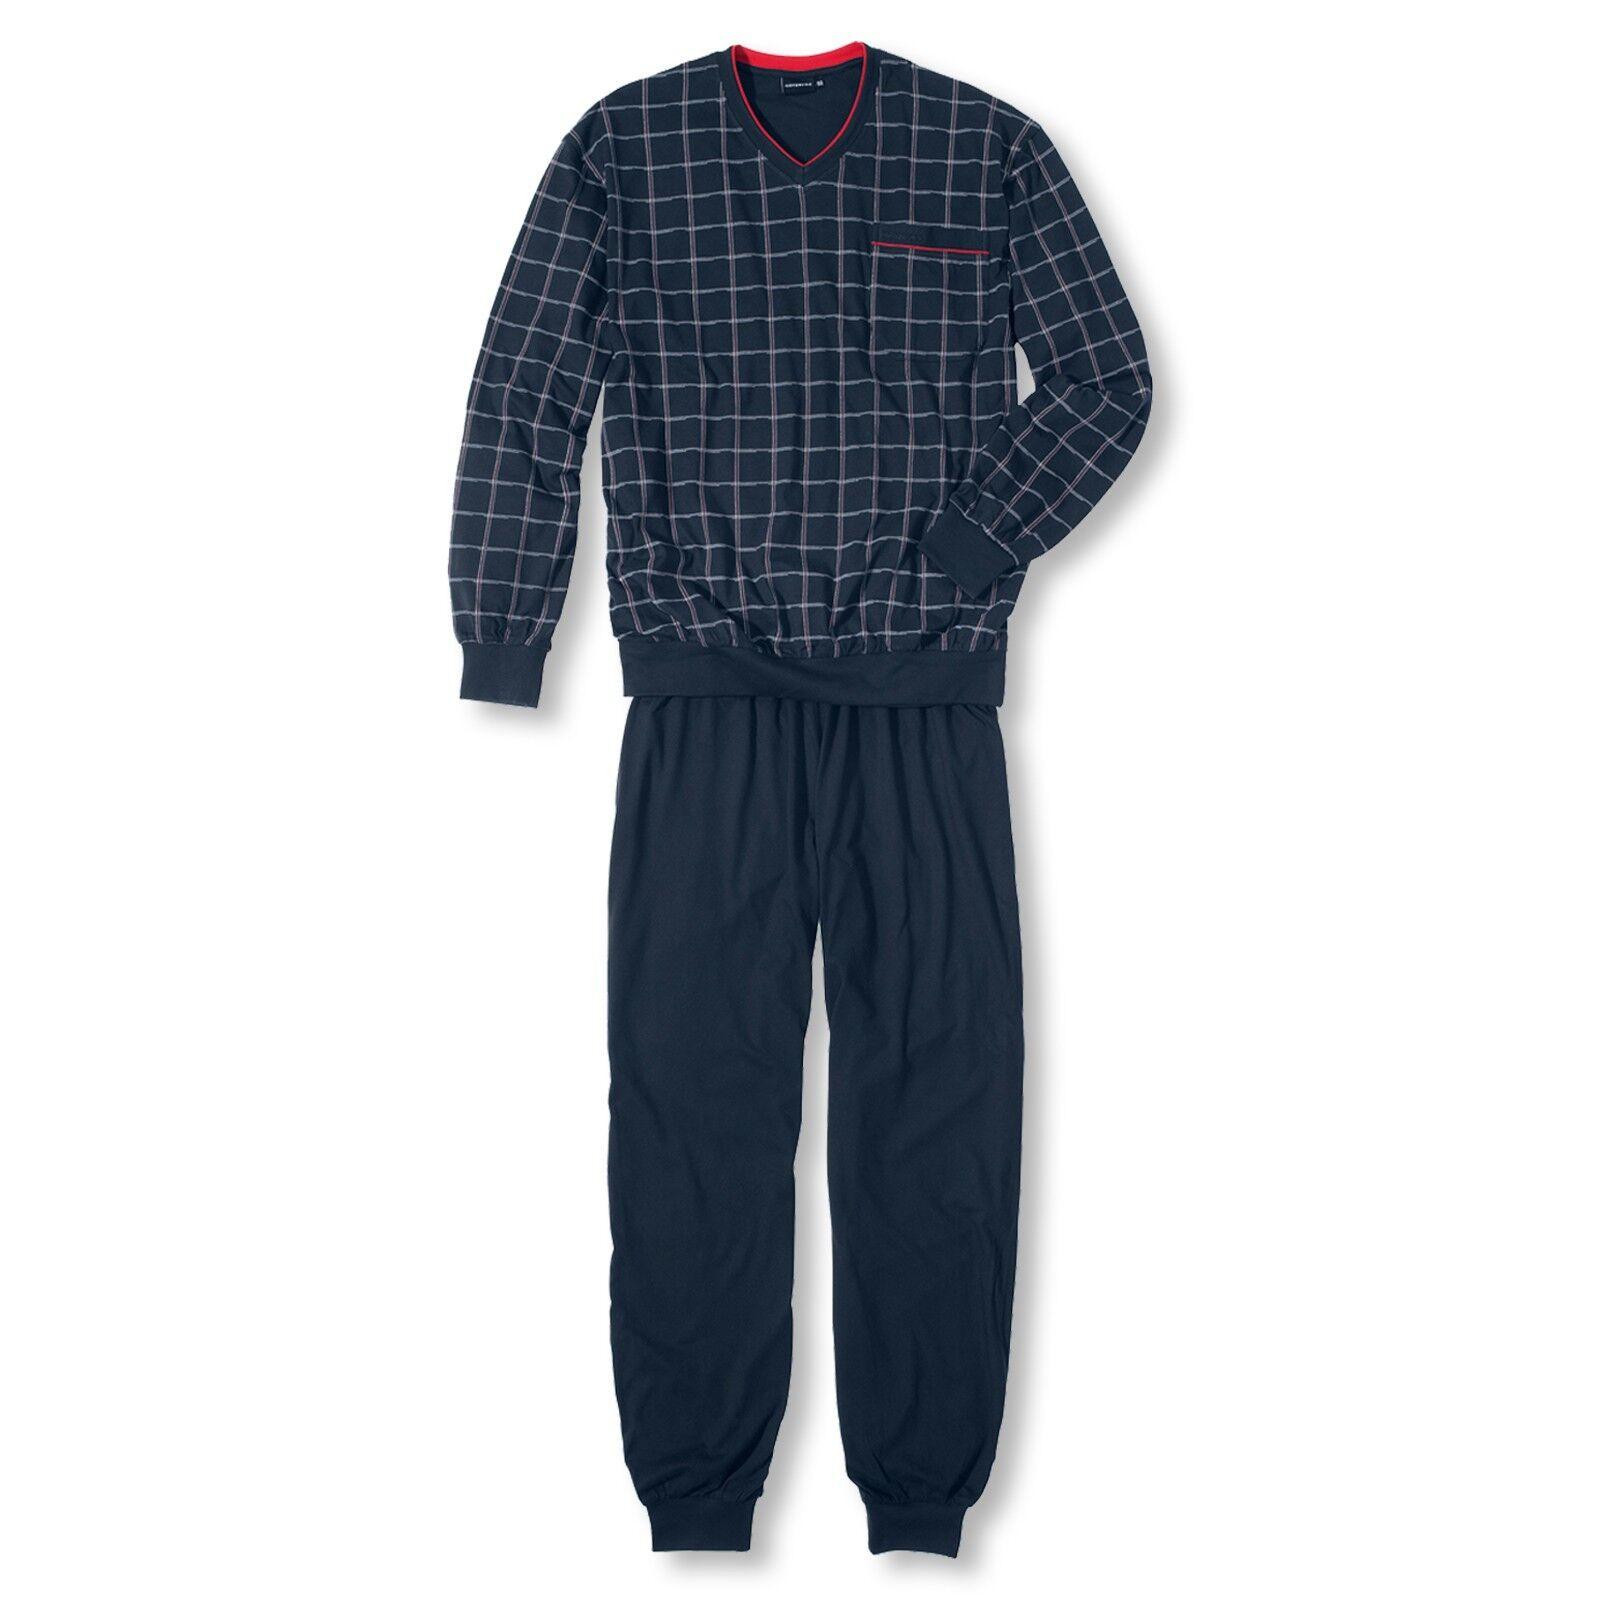 de8c7bc9efa855 Herren Pyjama Set Schlafanzug langarm Antonio S M XL XXL 3XL L Götzburg  npwegs6085-Nachtwäsche